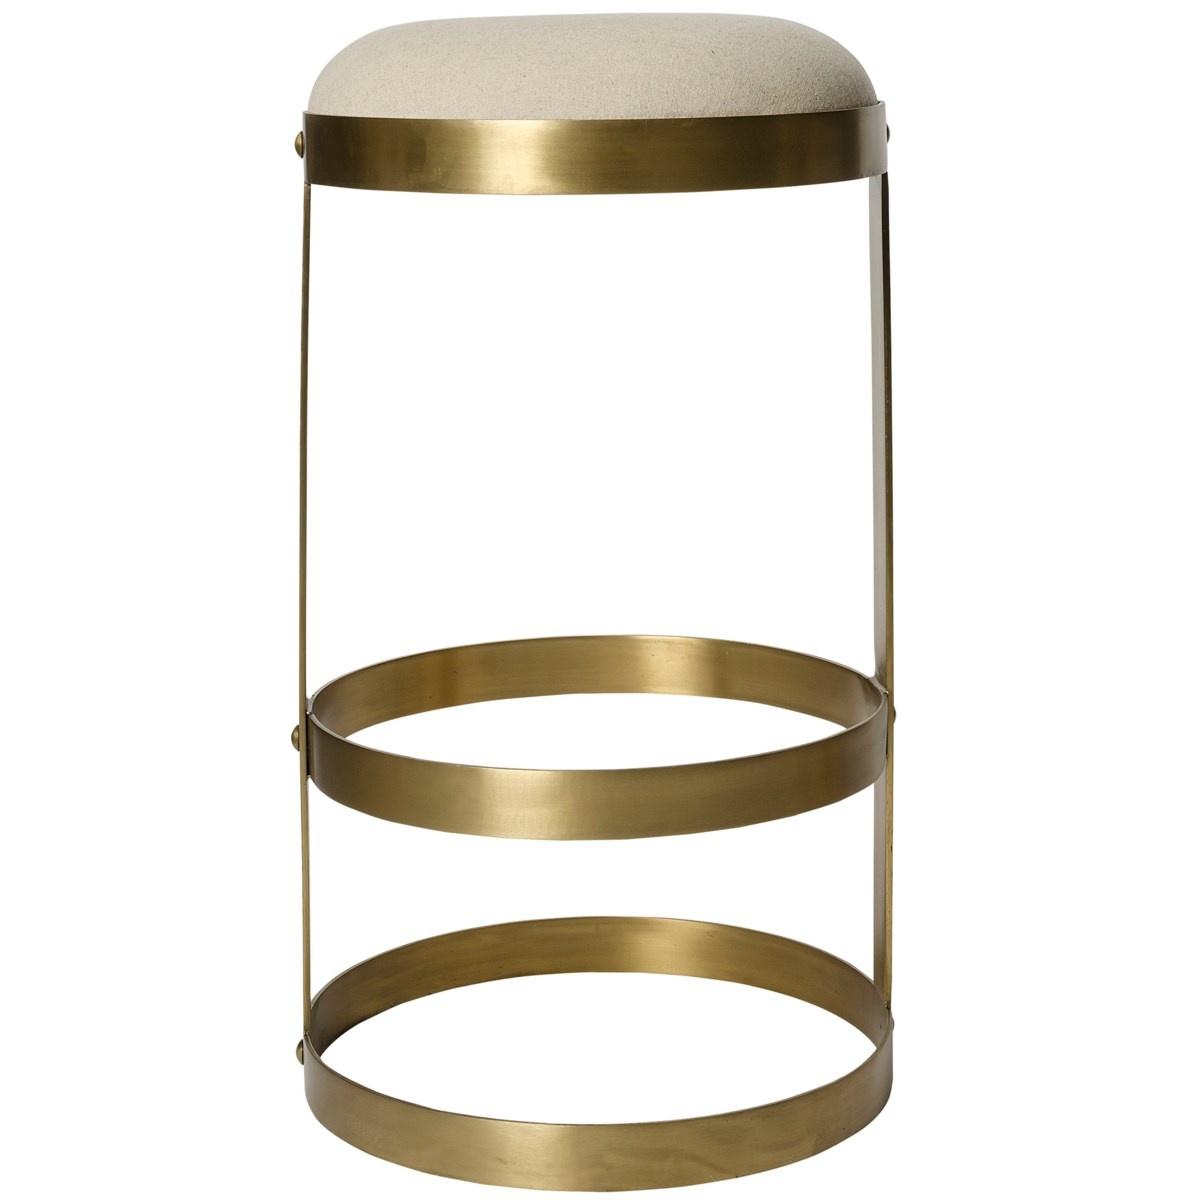 Dior Bar Stool, Antique Brass